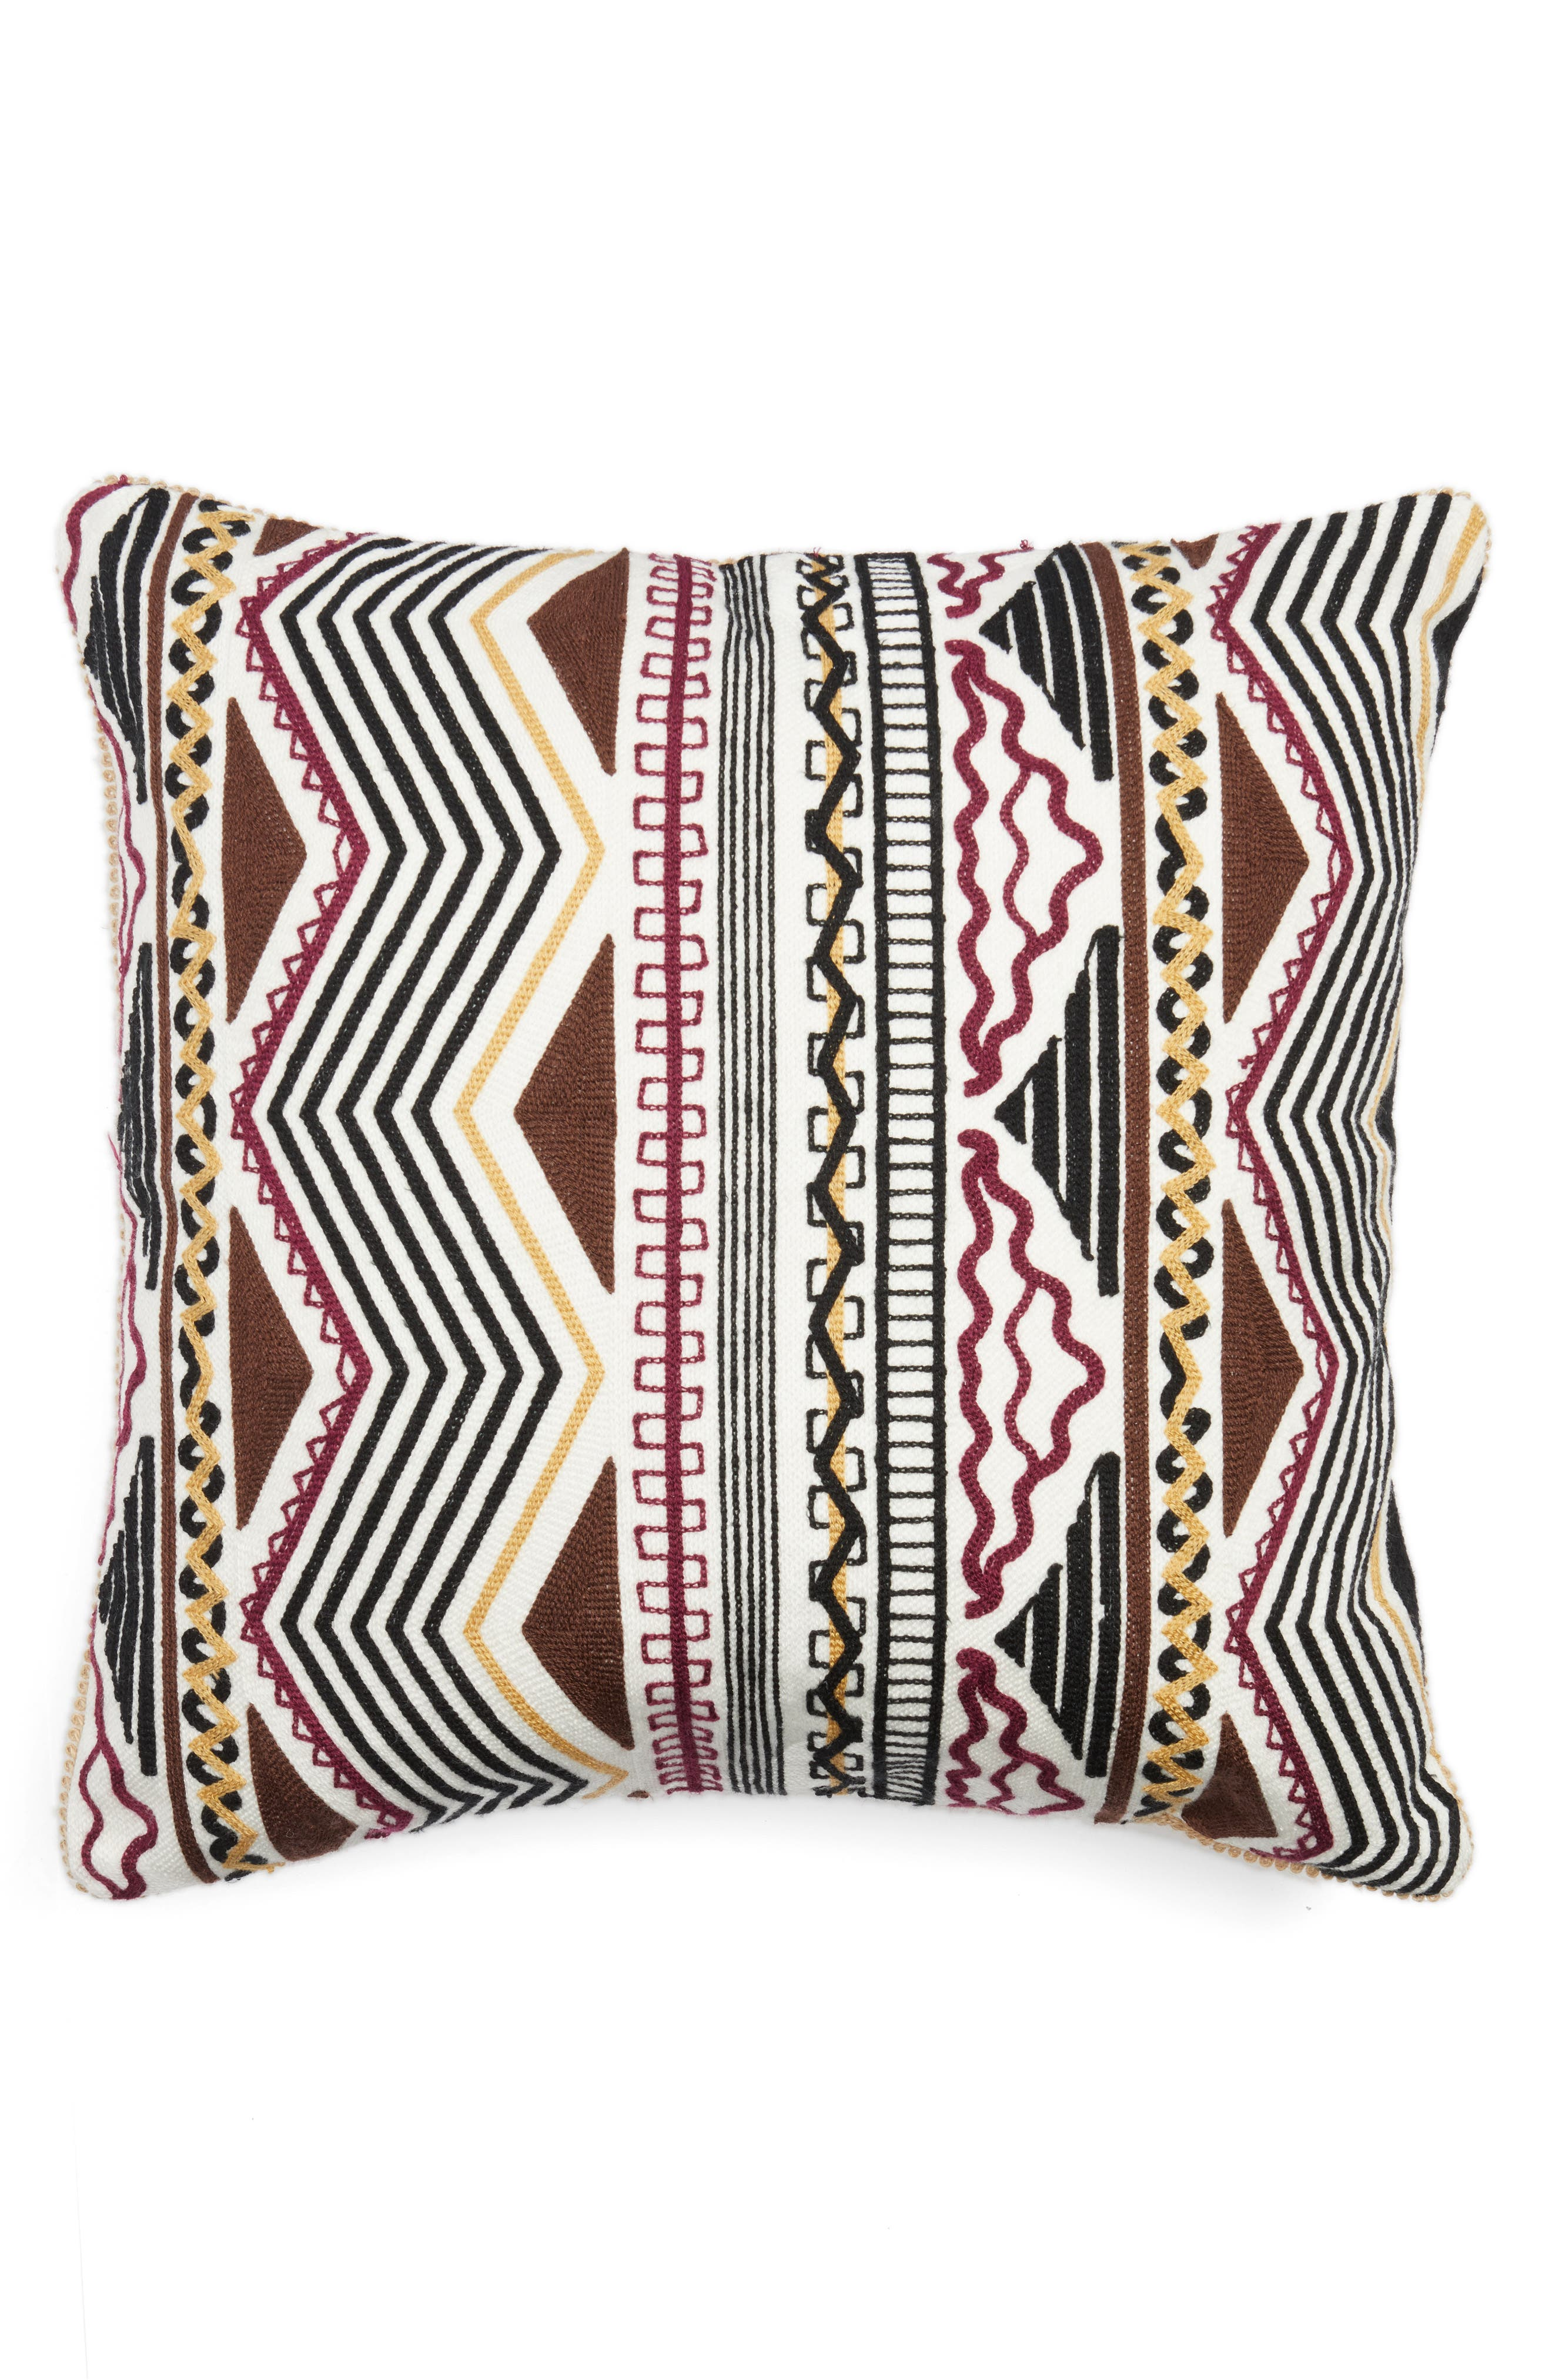 Levtex Zander Embroidered Pillow